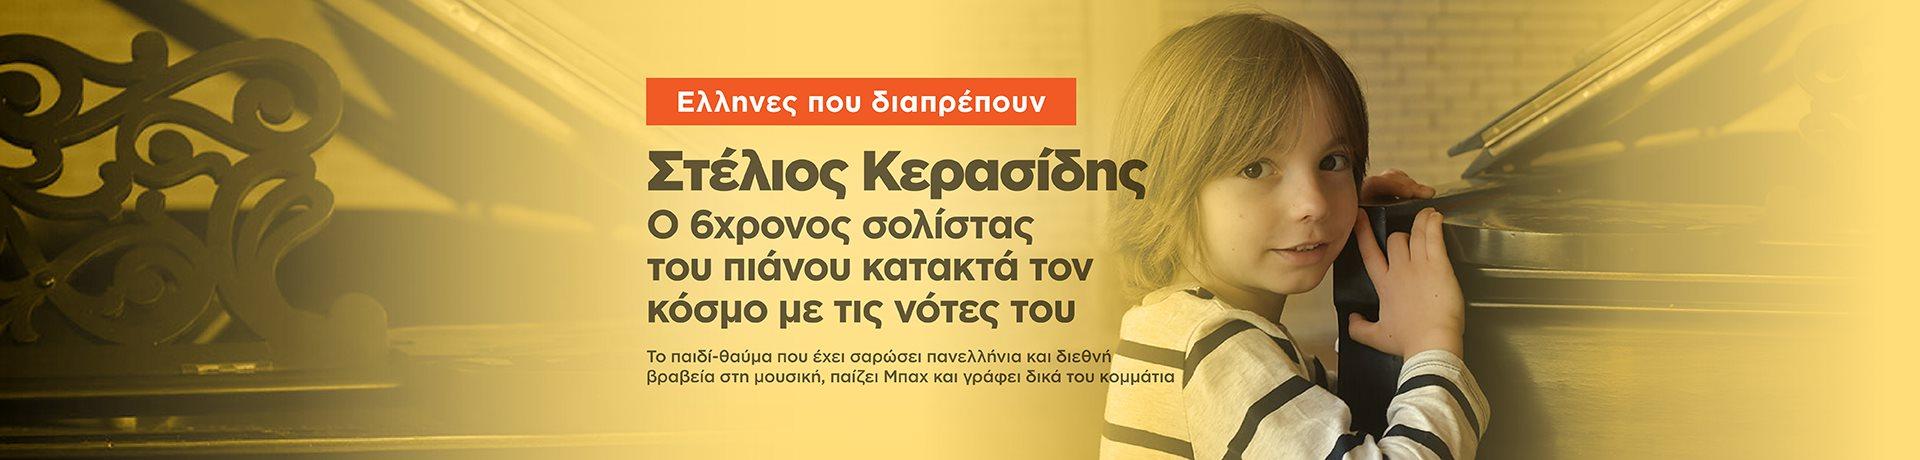 ee58a8338094 Πρώτο Θέμα - ειδήσεις από την Ελλάδα και όλο τον κόσμο - Έκτακτη ...